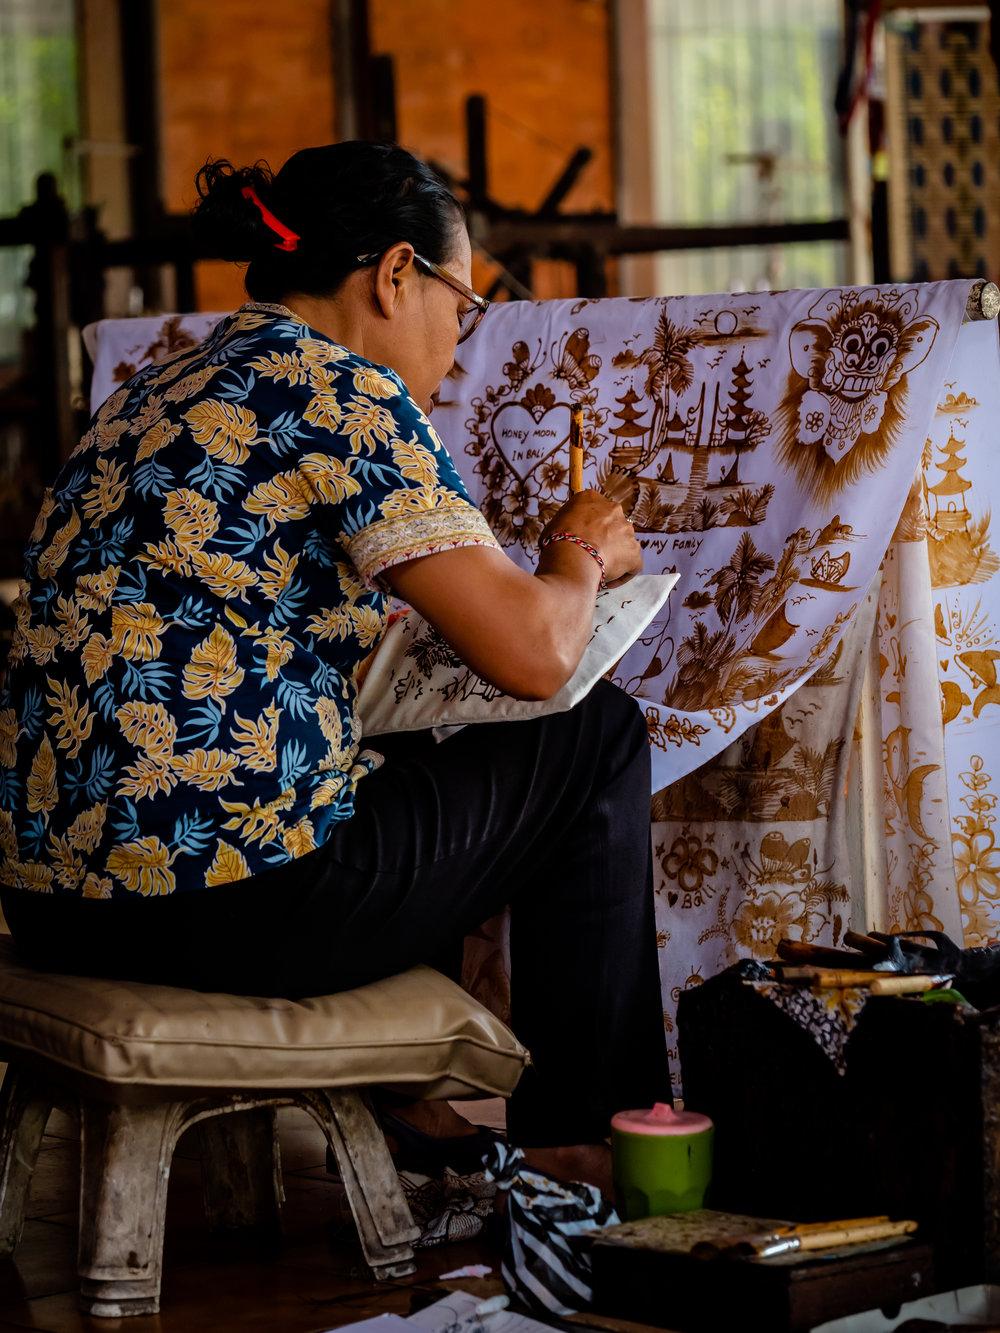 Musings by the Glass - Bali Photo Essay - Batik